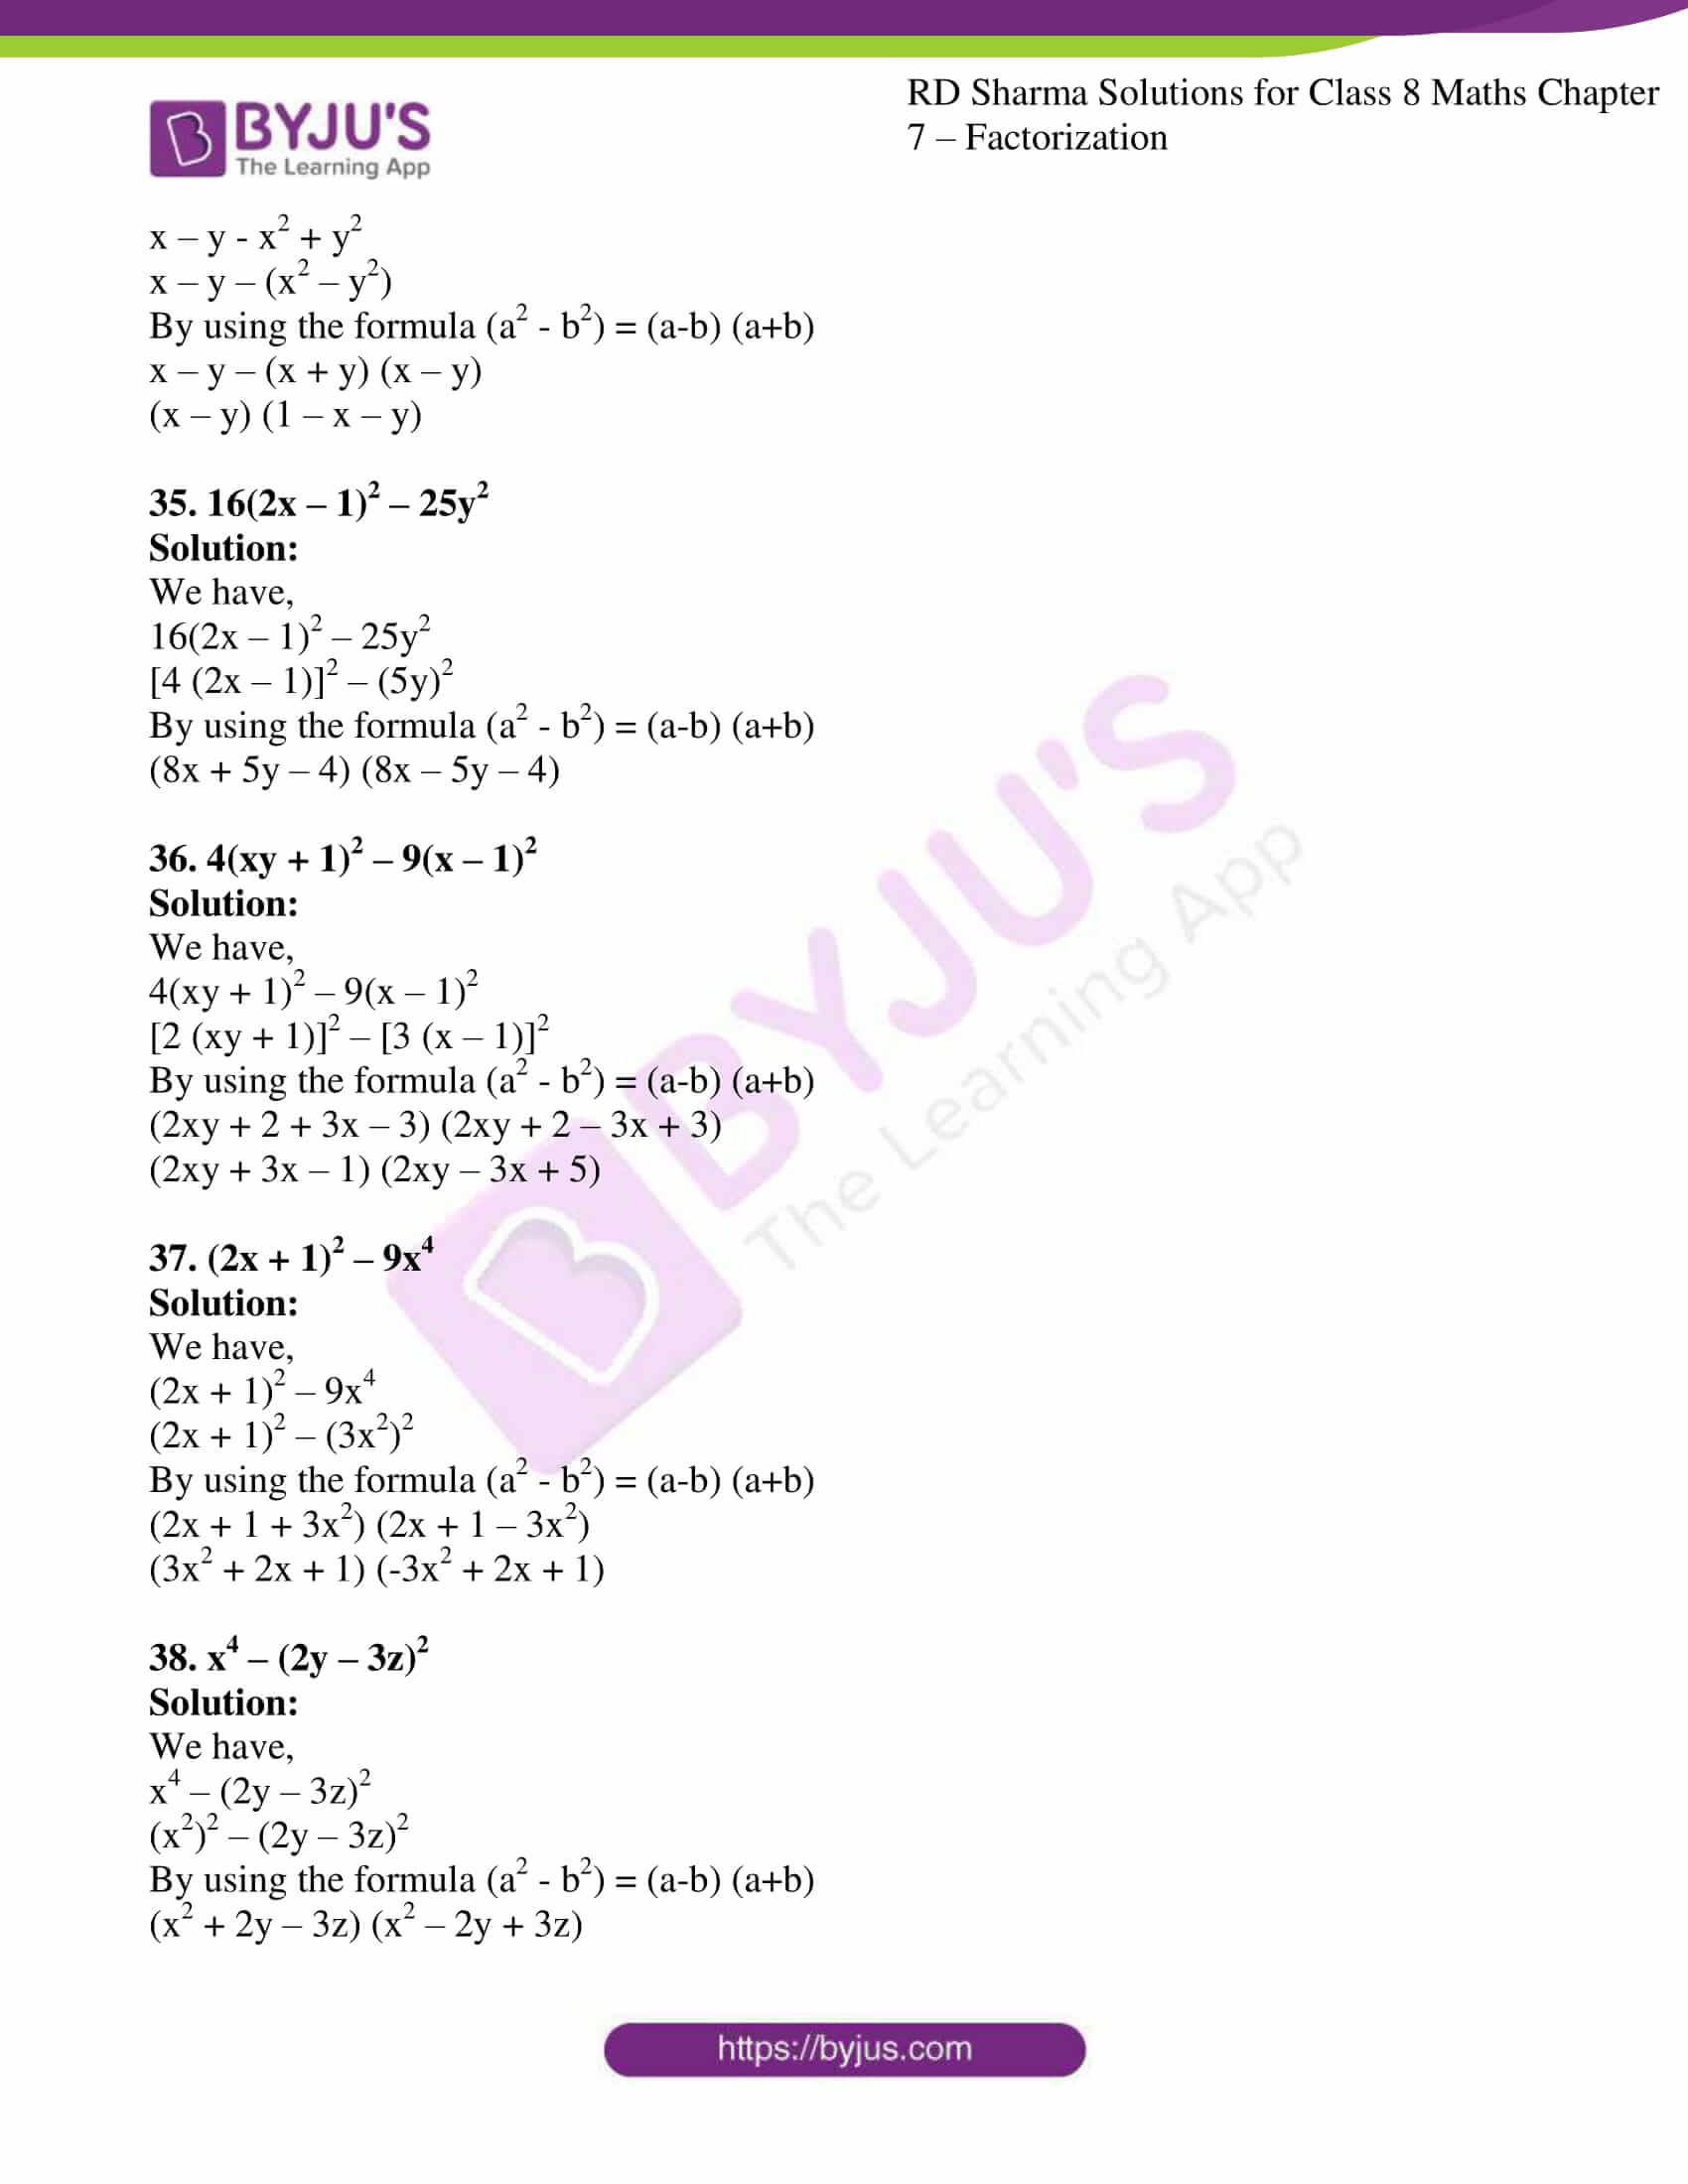 rd sharma class 8 maths chapter 7 exercise 5 09